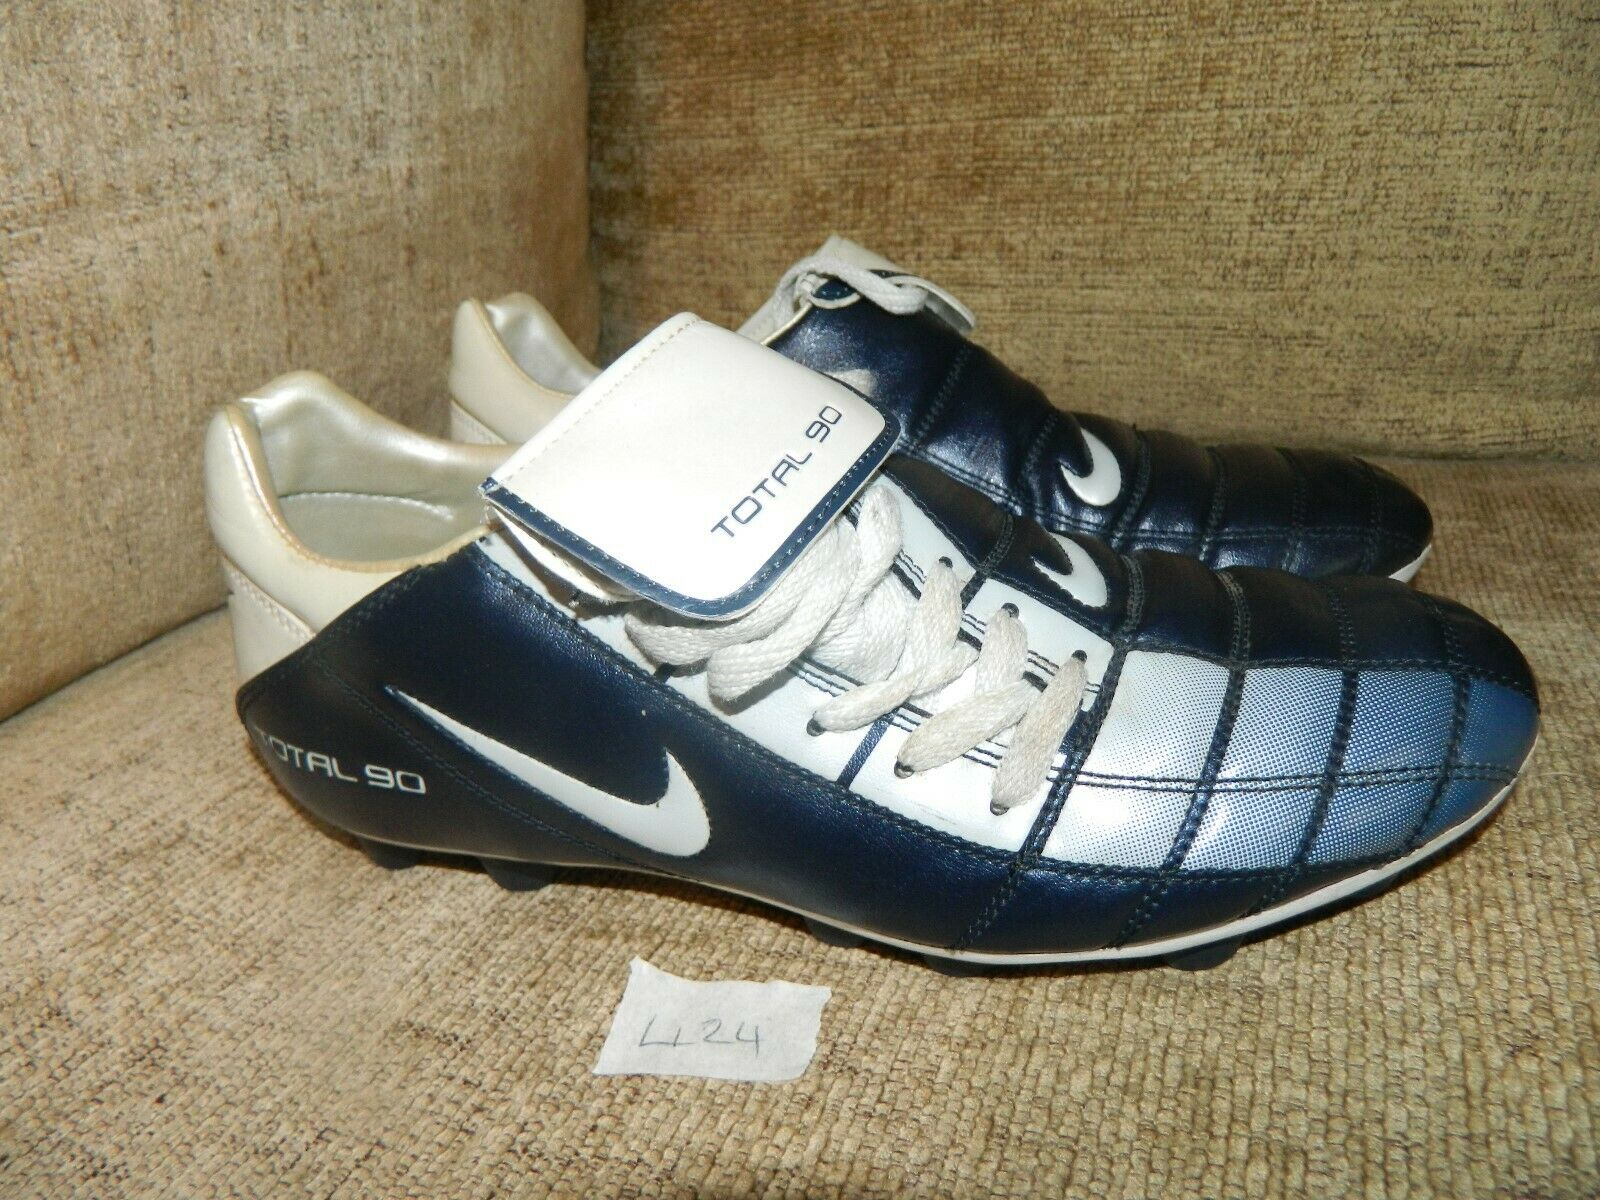 botas De Fútbol Nike Total 90 Cuero 7 EUR 41 Plata Azul  Raro  en muy buena condición COND